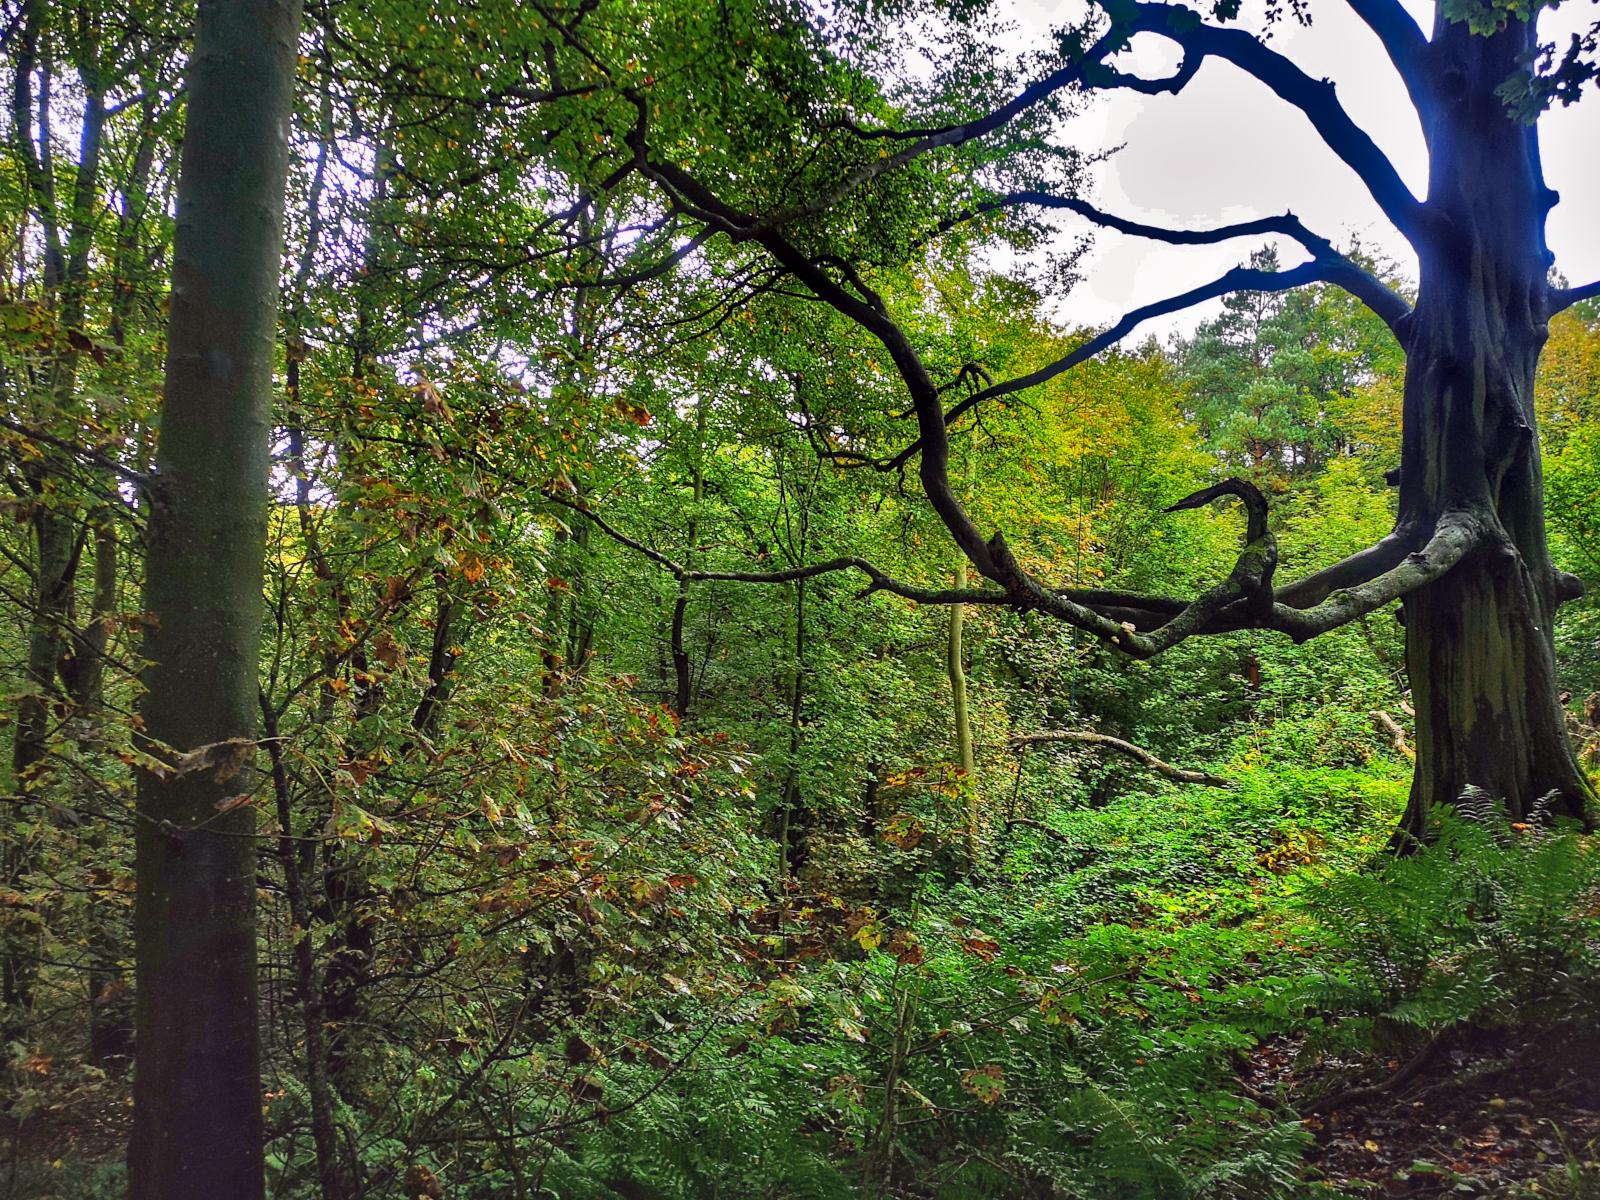 Badby Woods